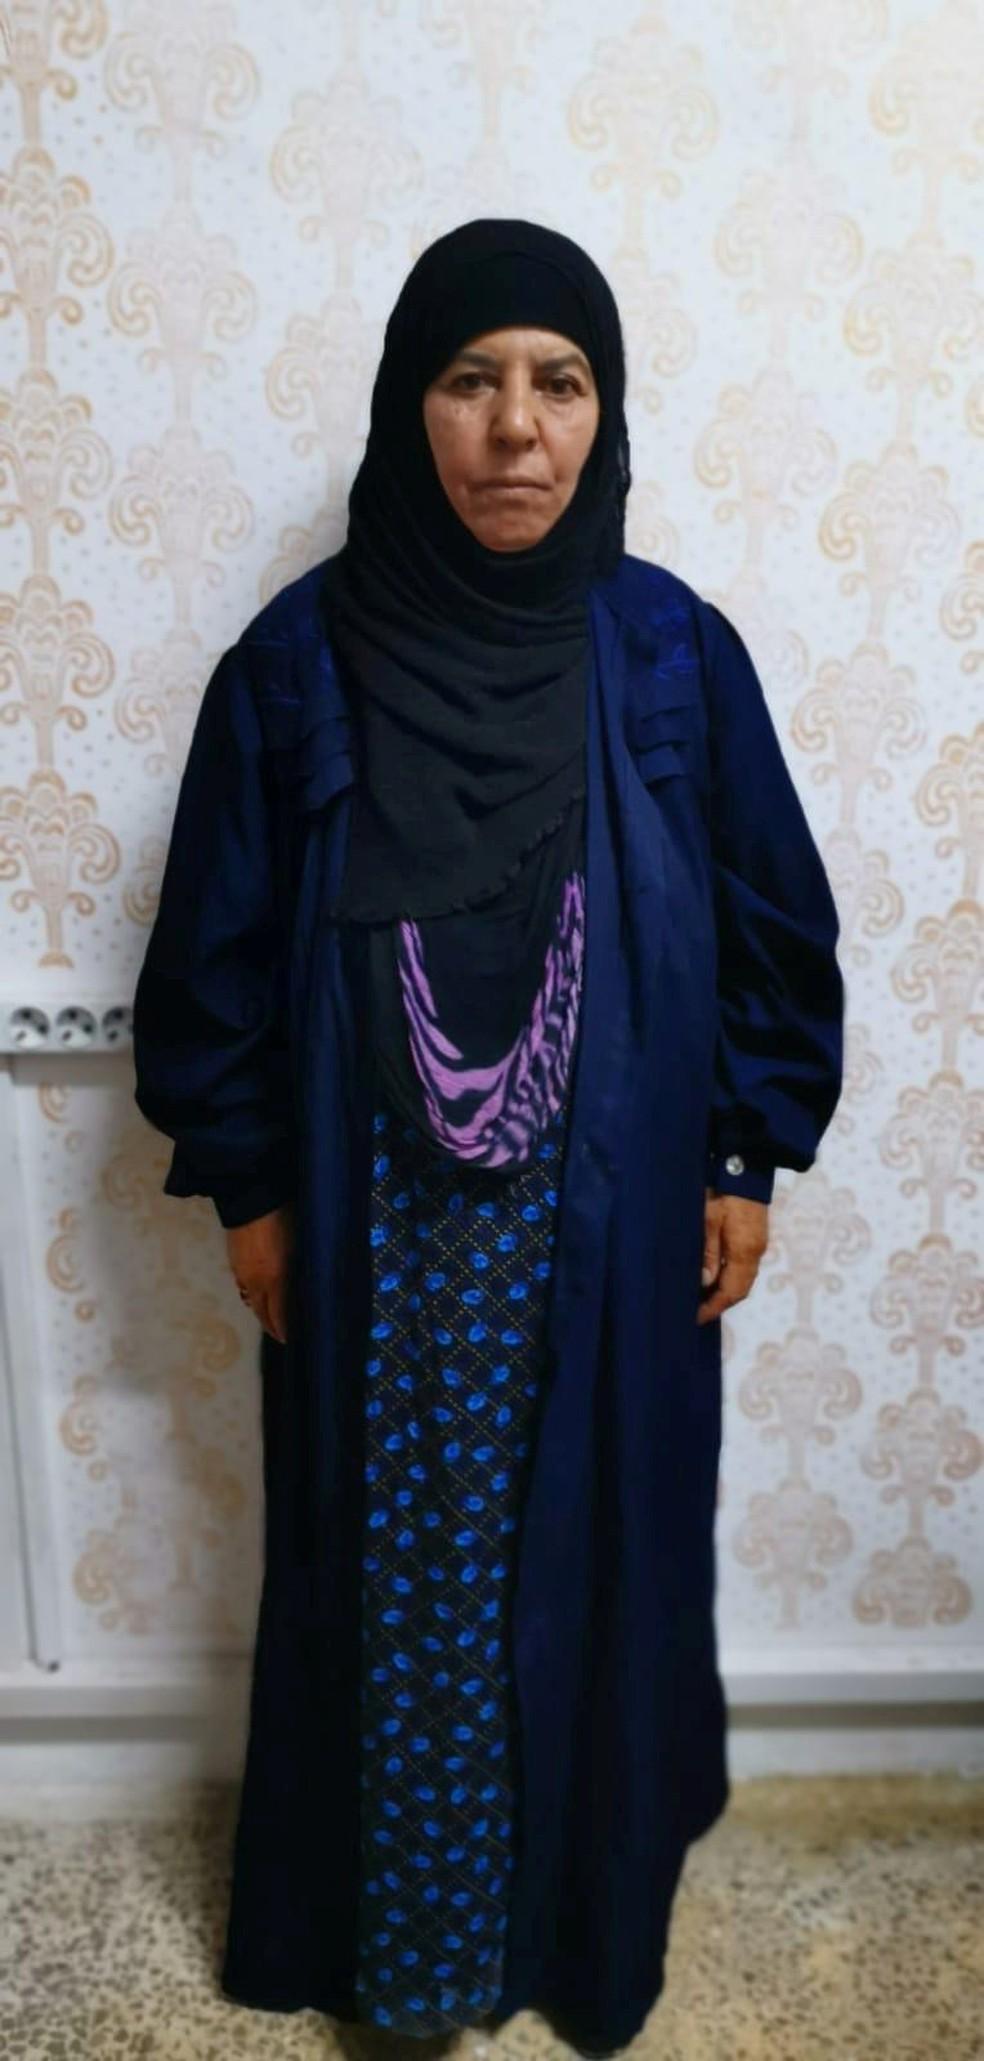 Abu Bakr Al-Baghdadi's sister Rasmiya Awad has been arrested in Turkey - Photo: Turkish security officials / Reuters